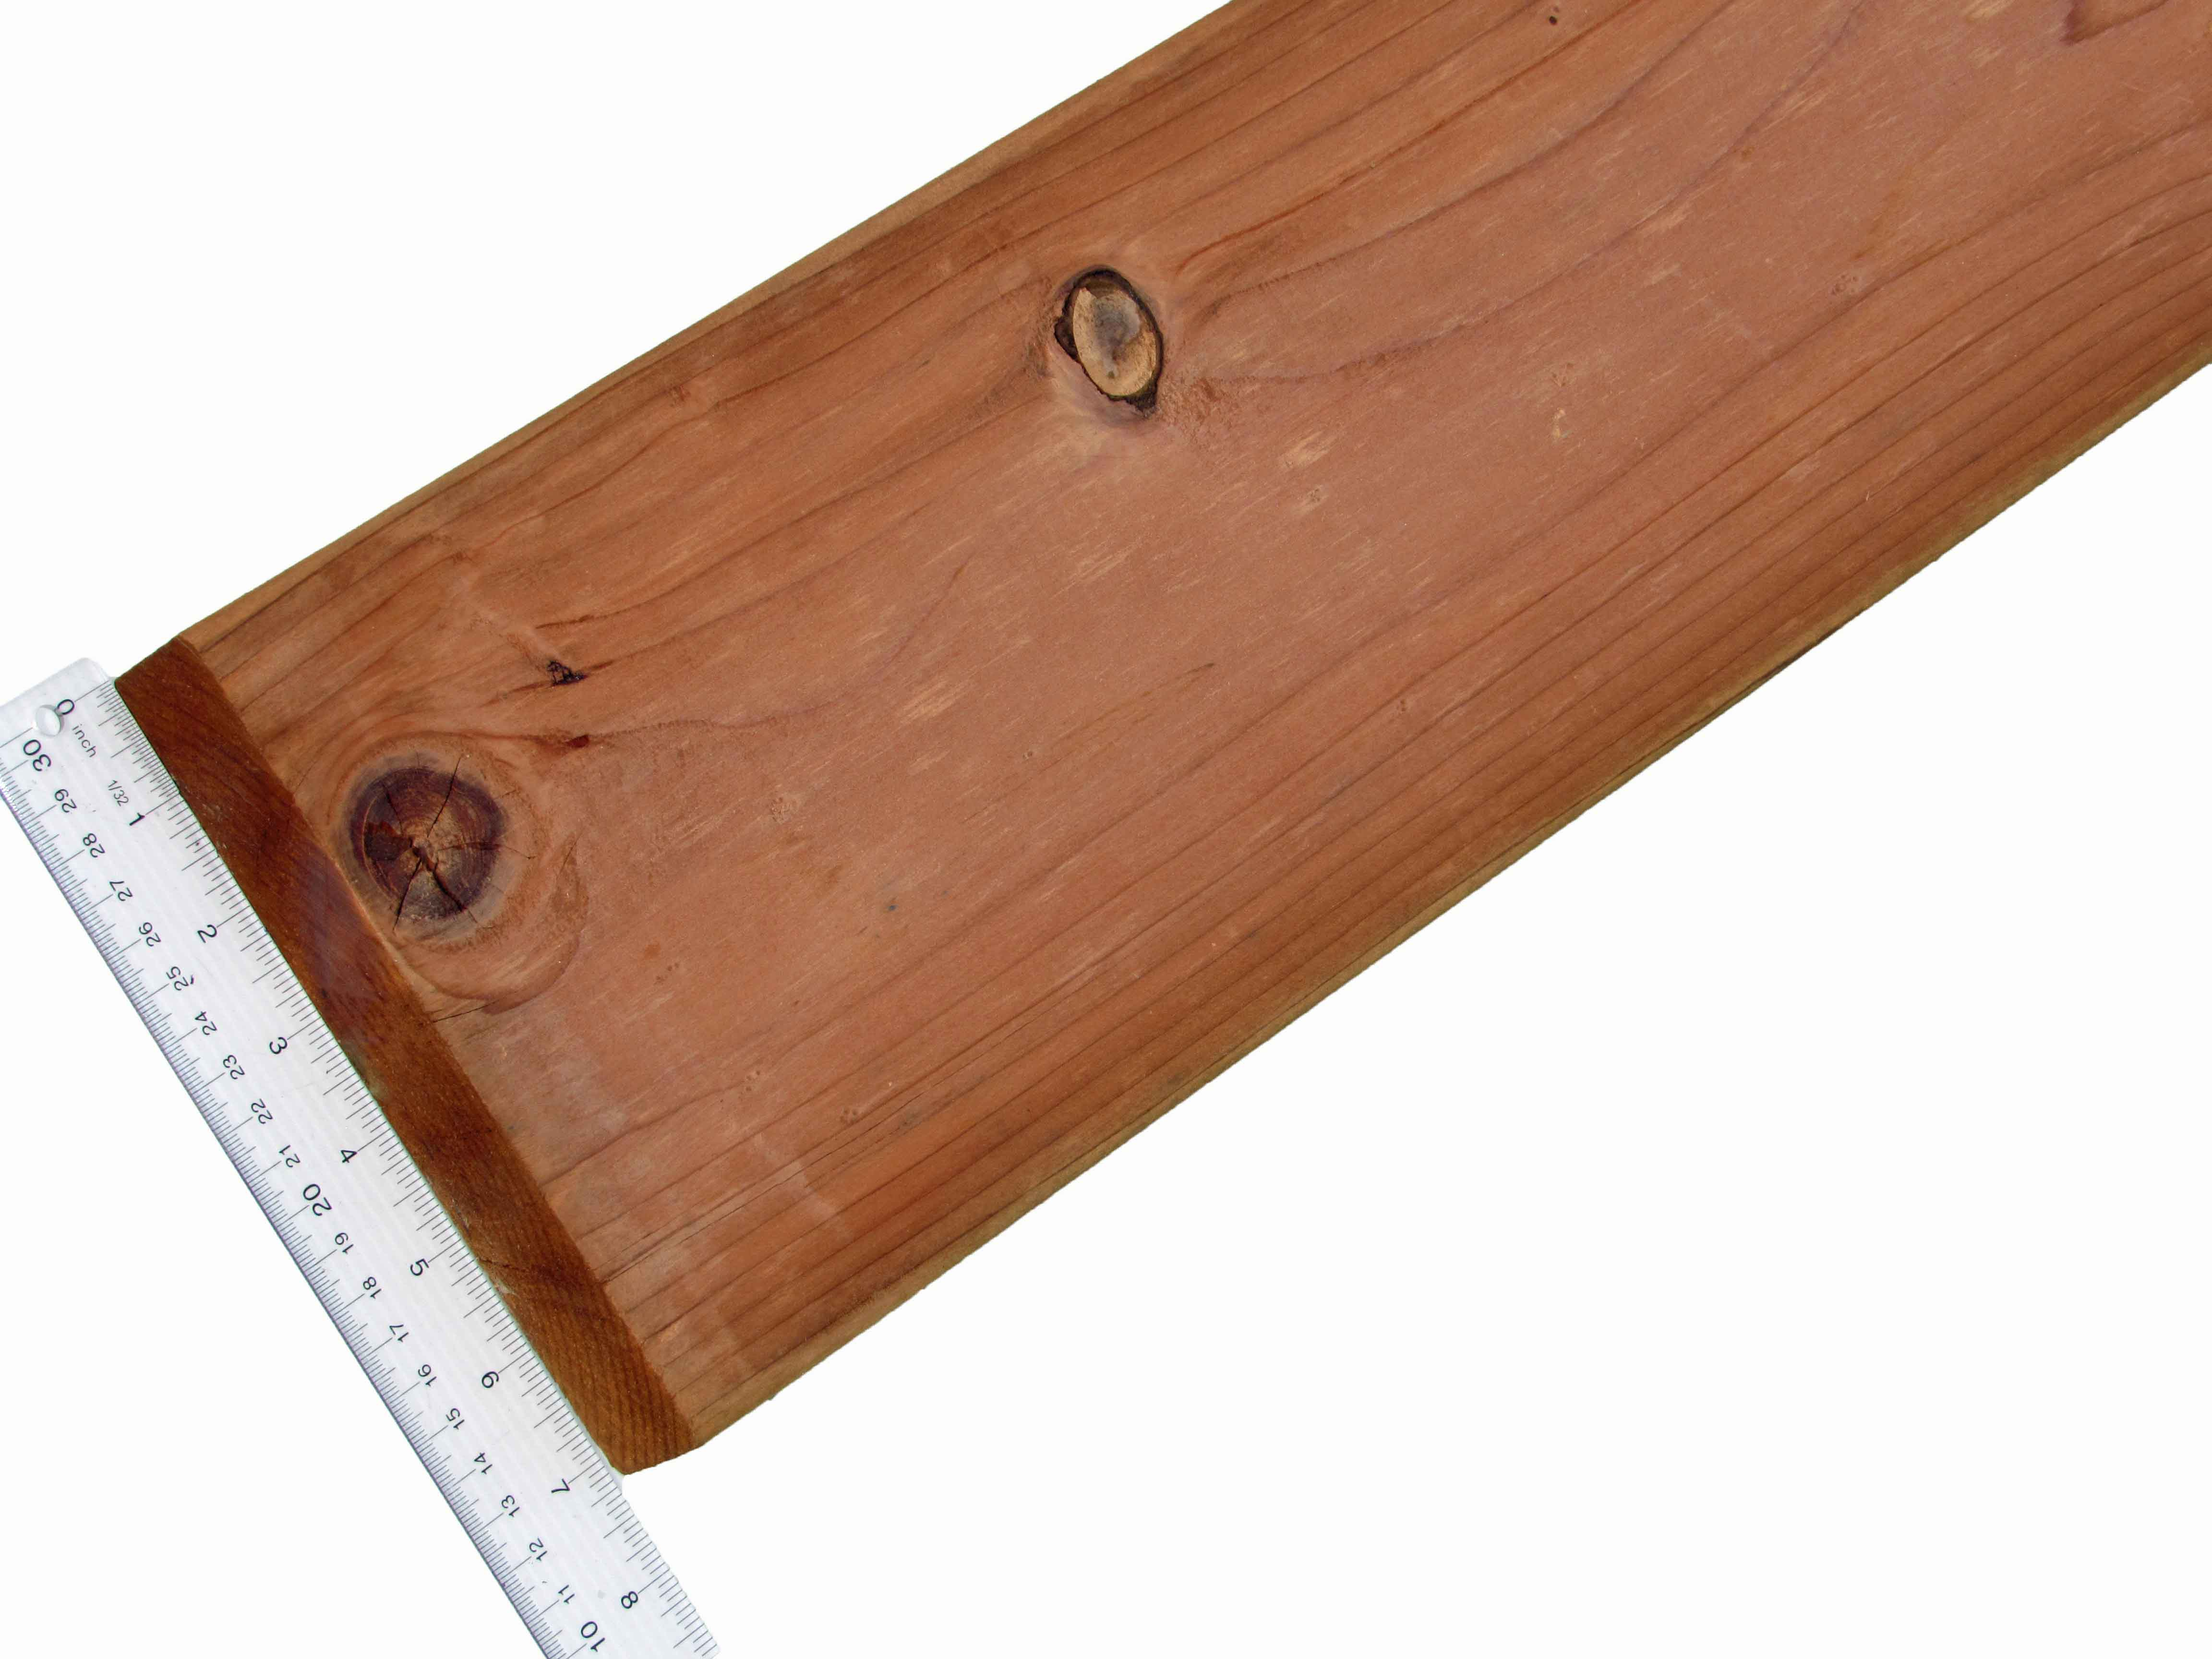 2x8 Construction Redwood Lumber S4s Capitol City Lumber